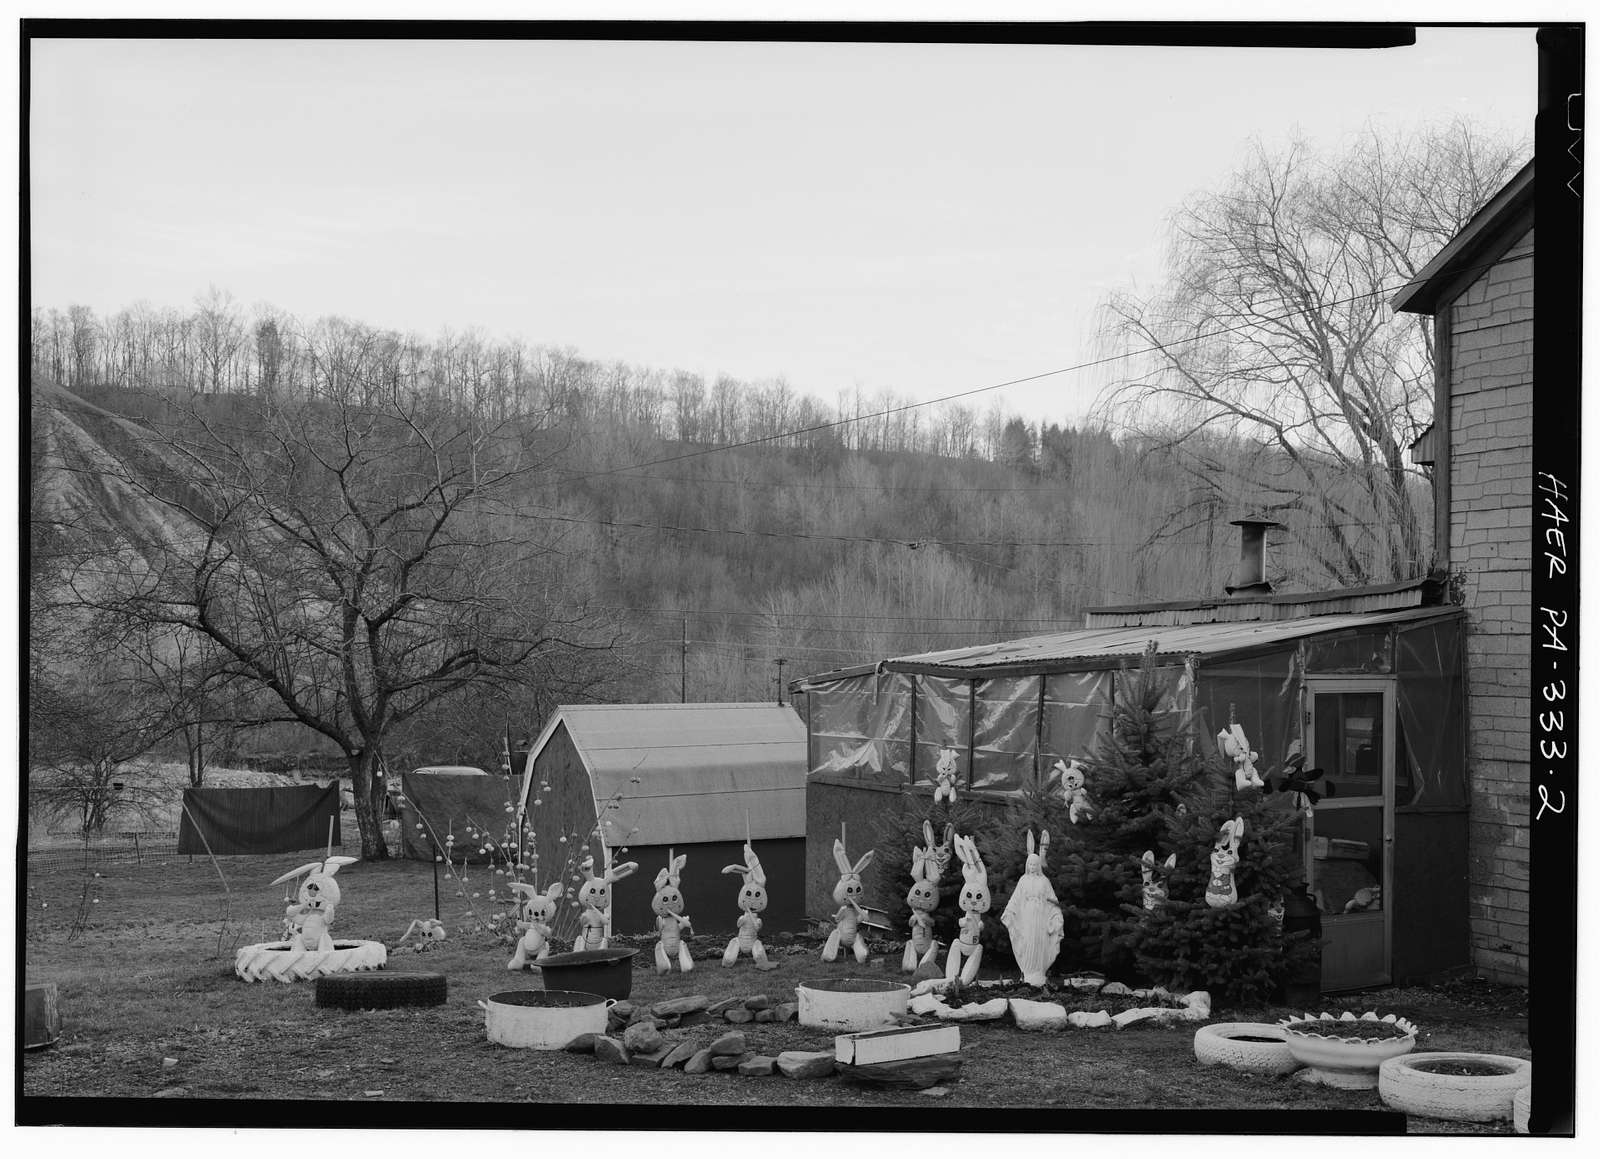 Town of Eureka No. 36, Northeast of Windber, Windber, Somerset County, PA